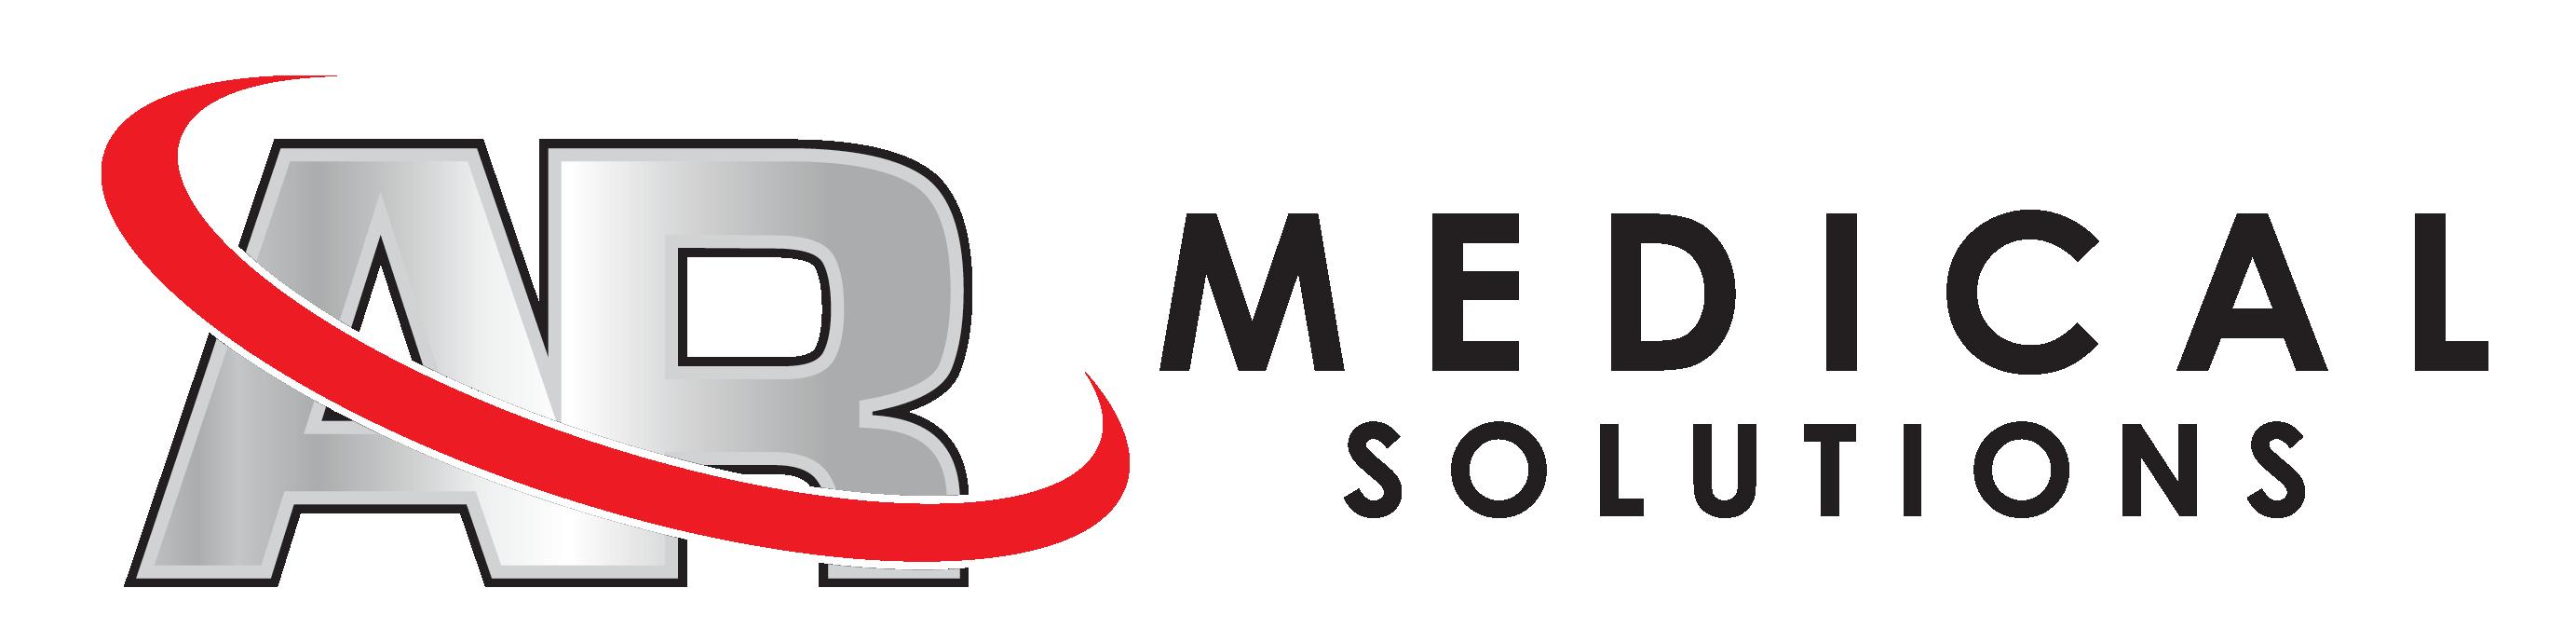 AR Medical Solutions